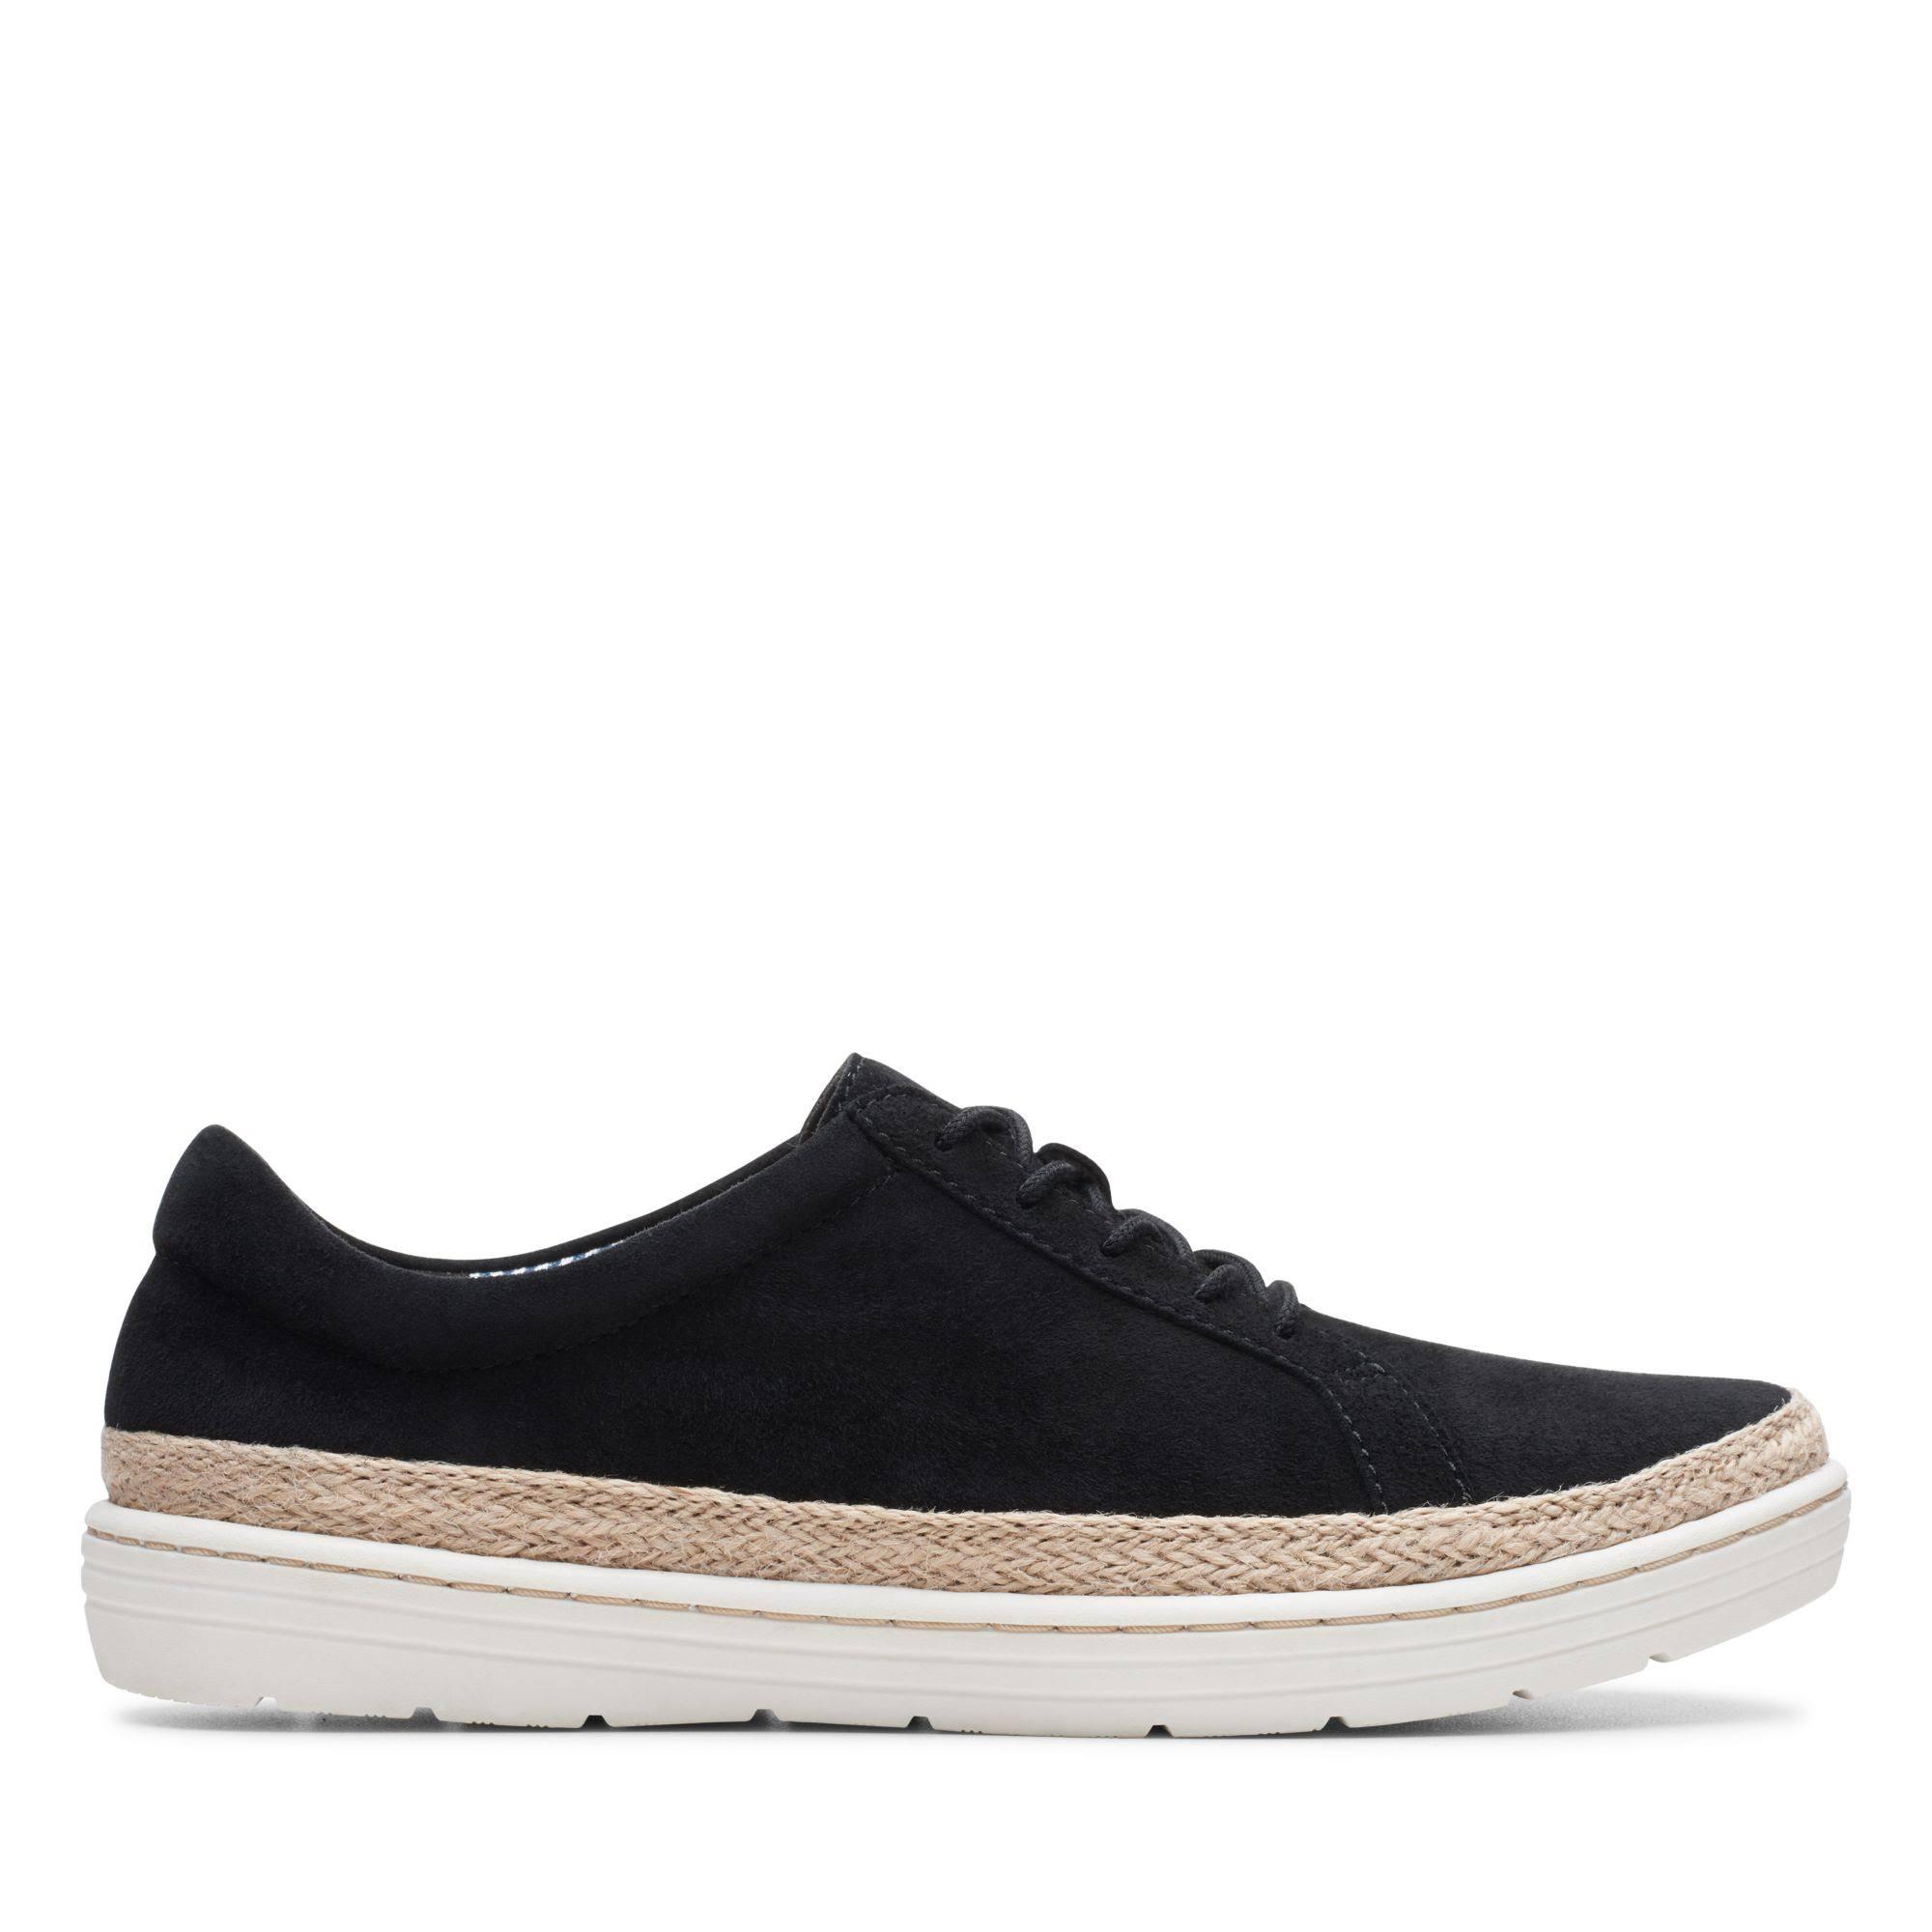 Sandalo Nero 6 Taglia Donna Nebbia Marie Clarks F5l13cTKuJ